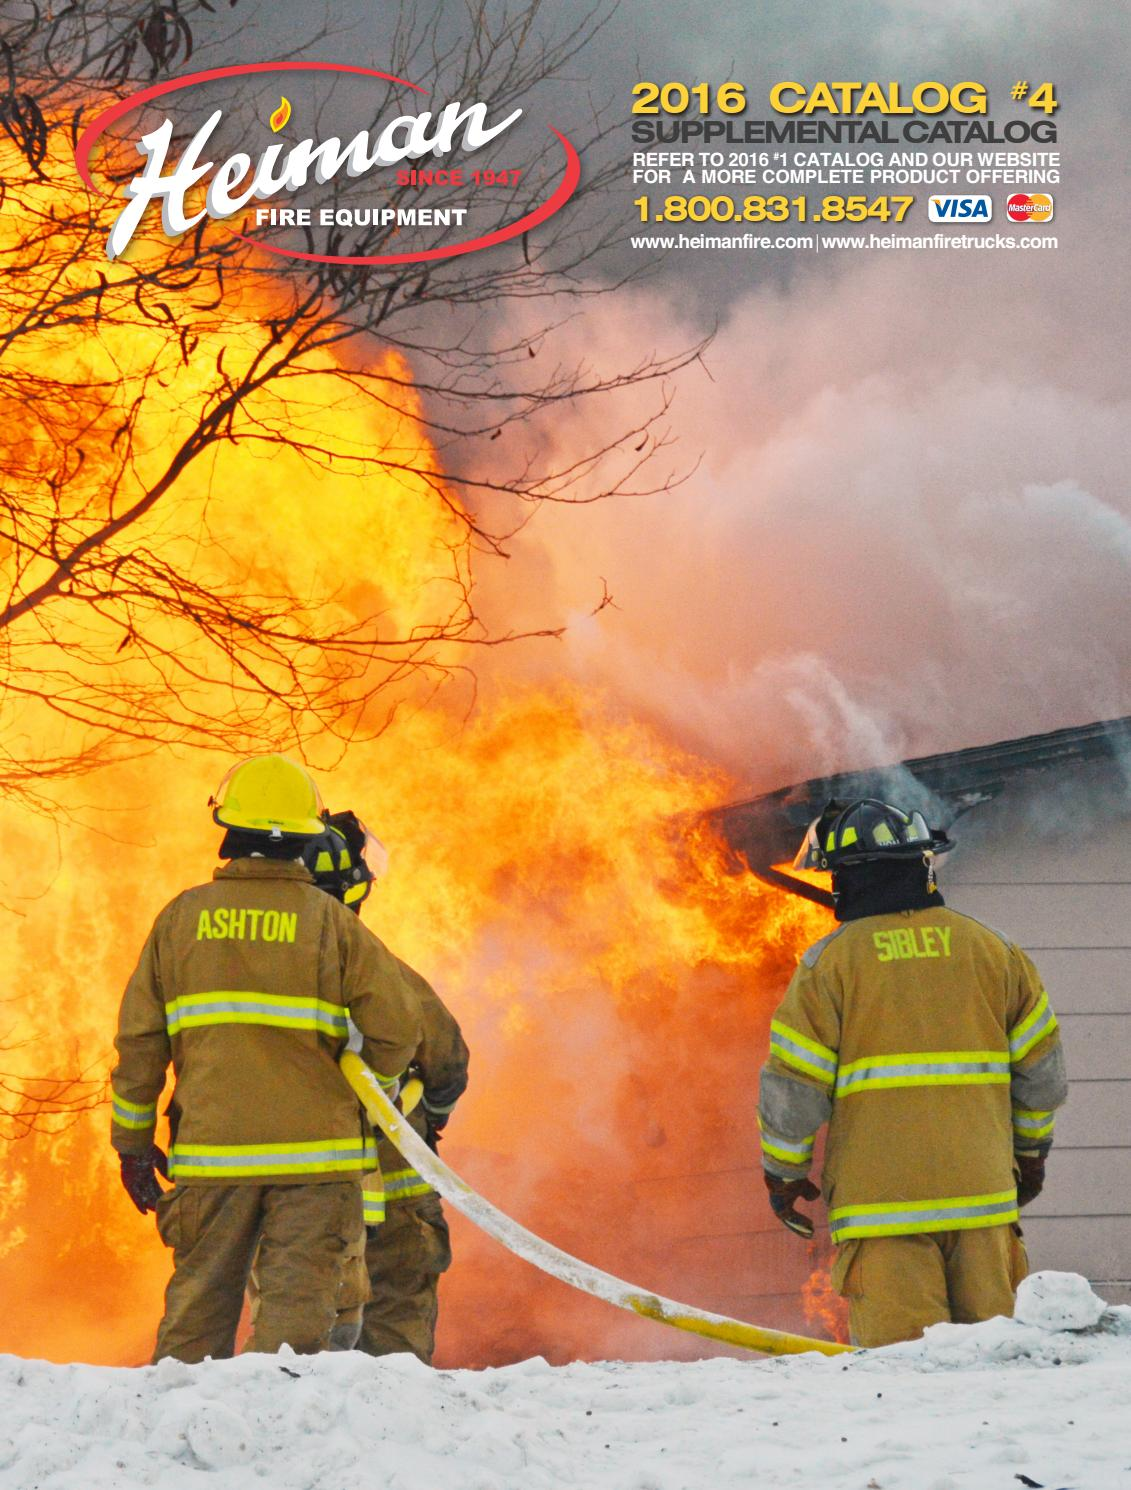 Heiman Fire 2016 4 Catalog By Equipment Issuu Pot Pro Circuit Works Husqvarna